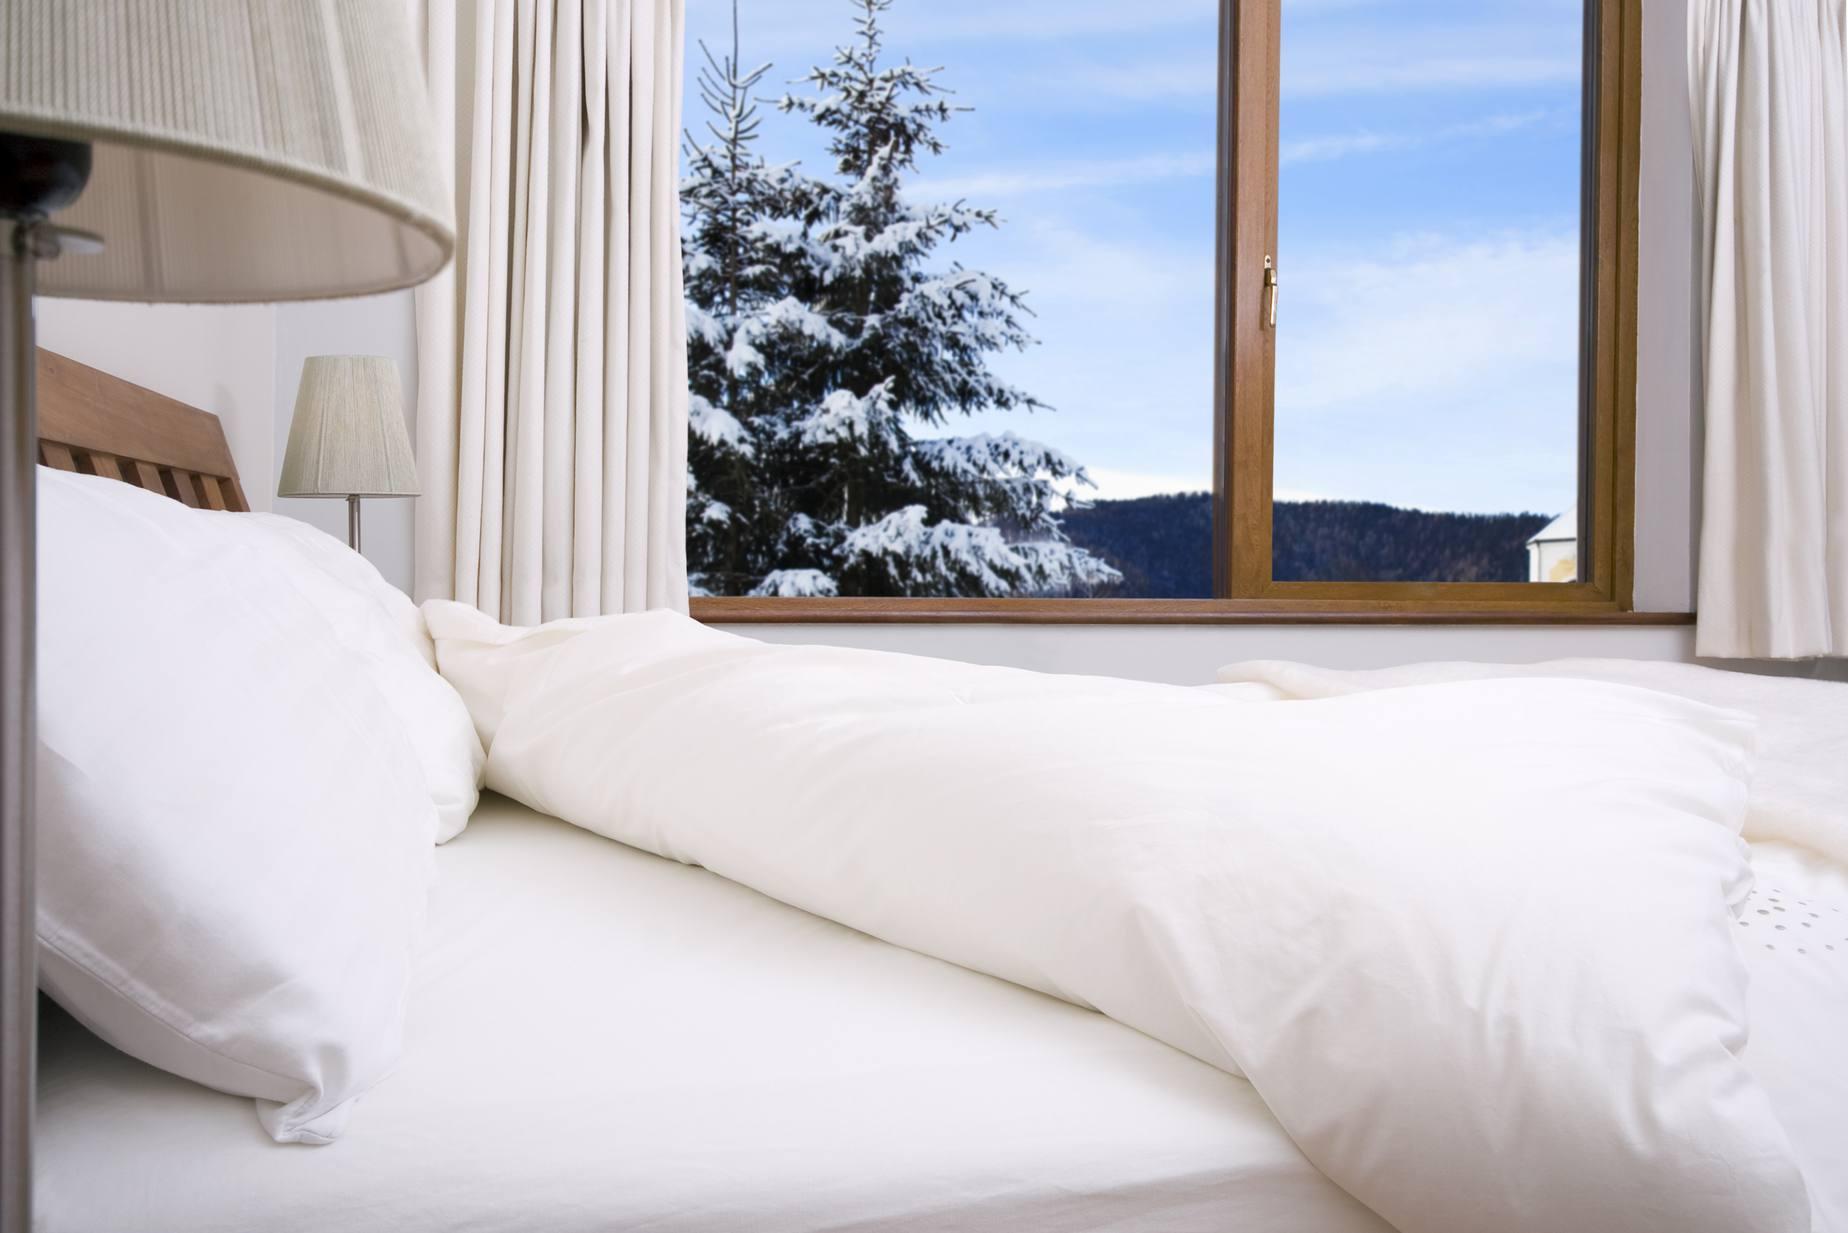 bedroom linens pillows